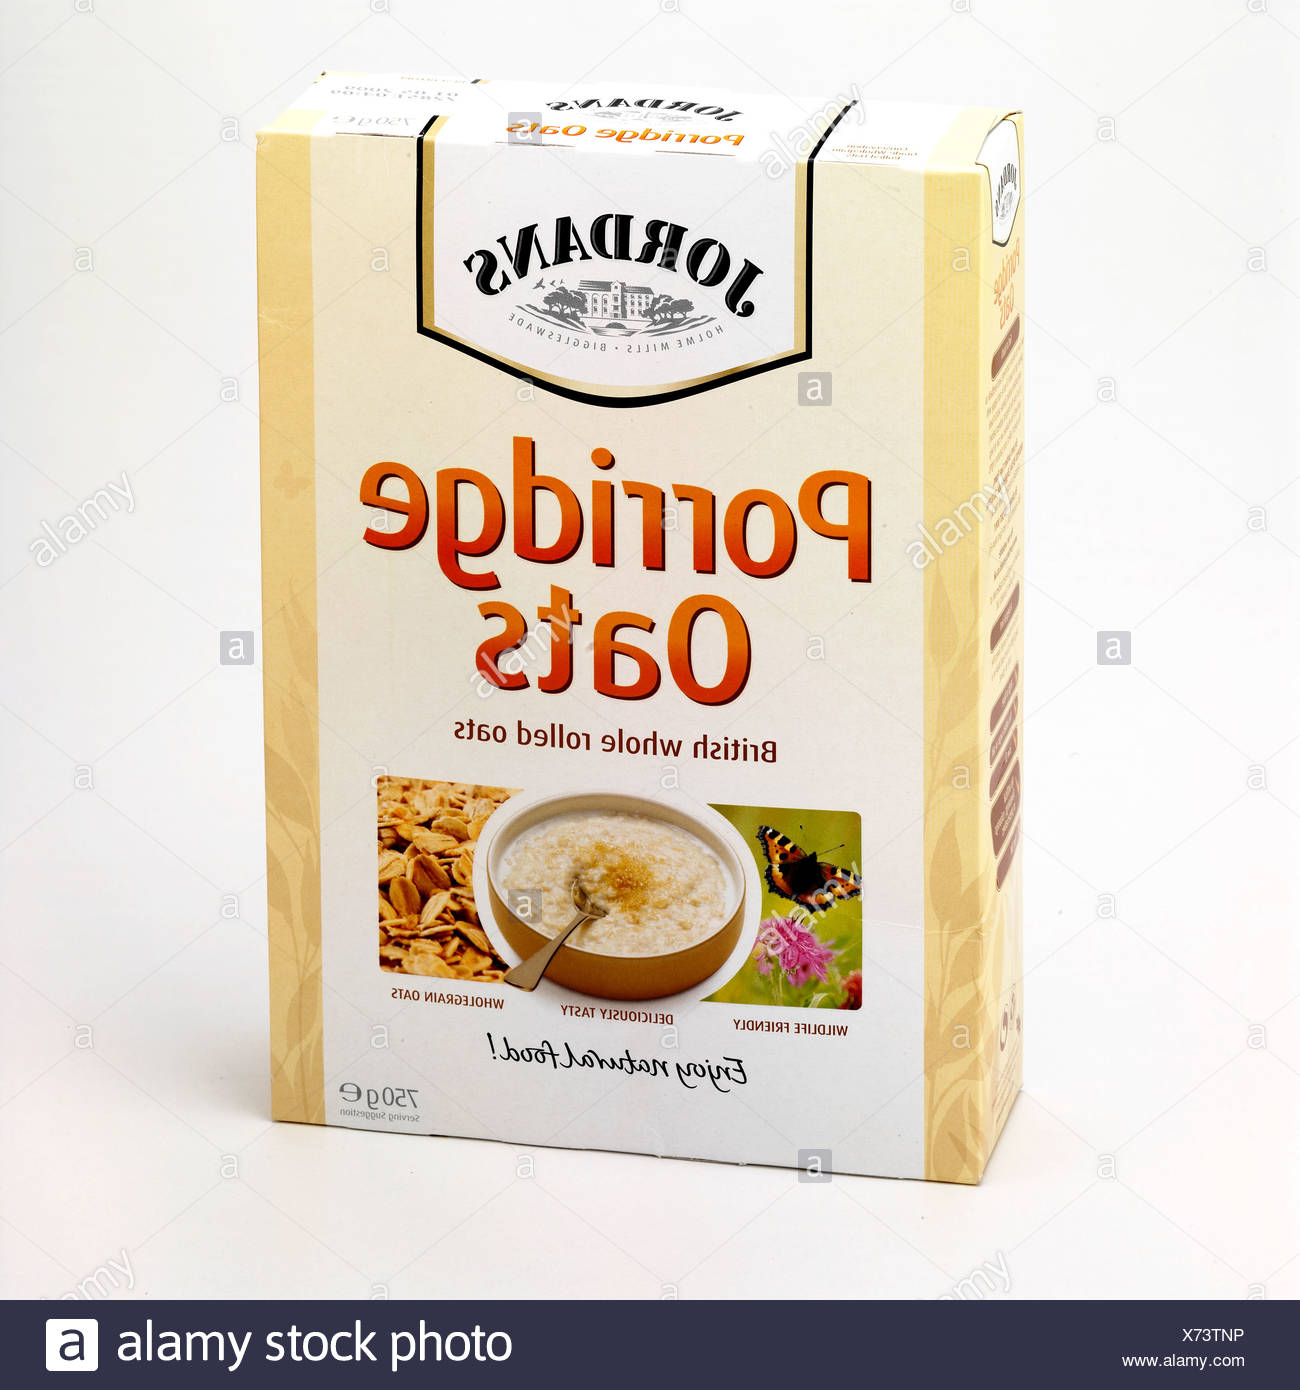 Porridge Oats Box Stock Photos & Porridge Oats Box Stock Images - Alamy